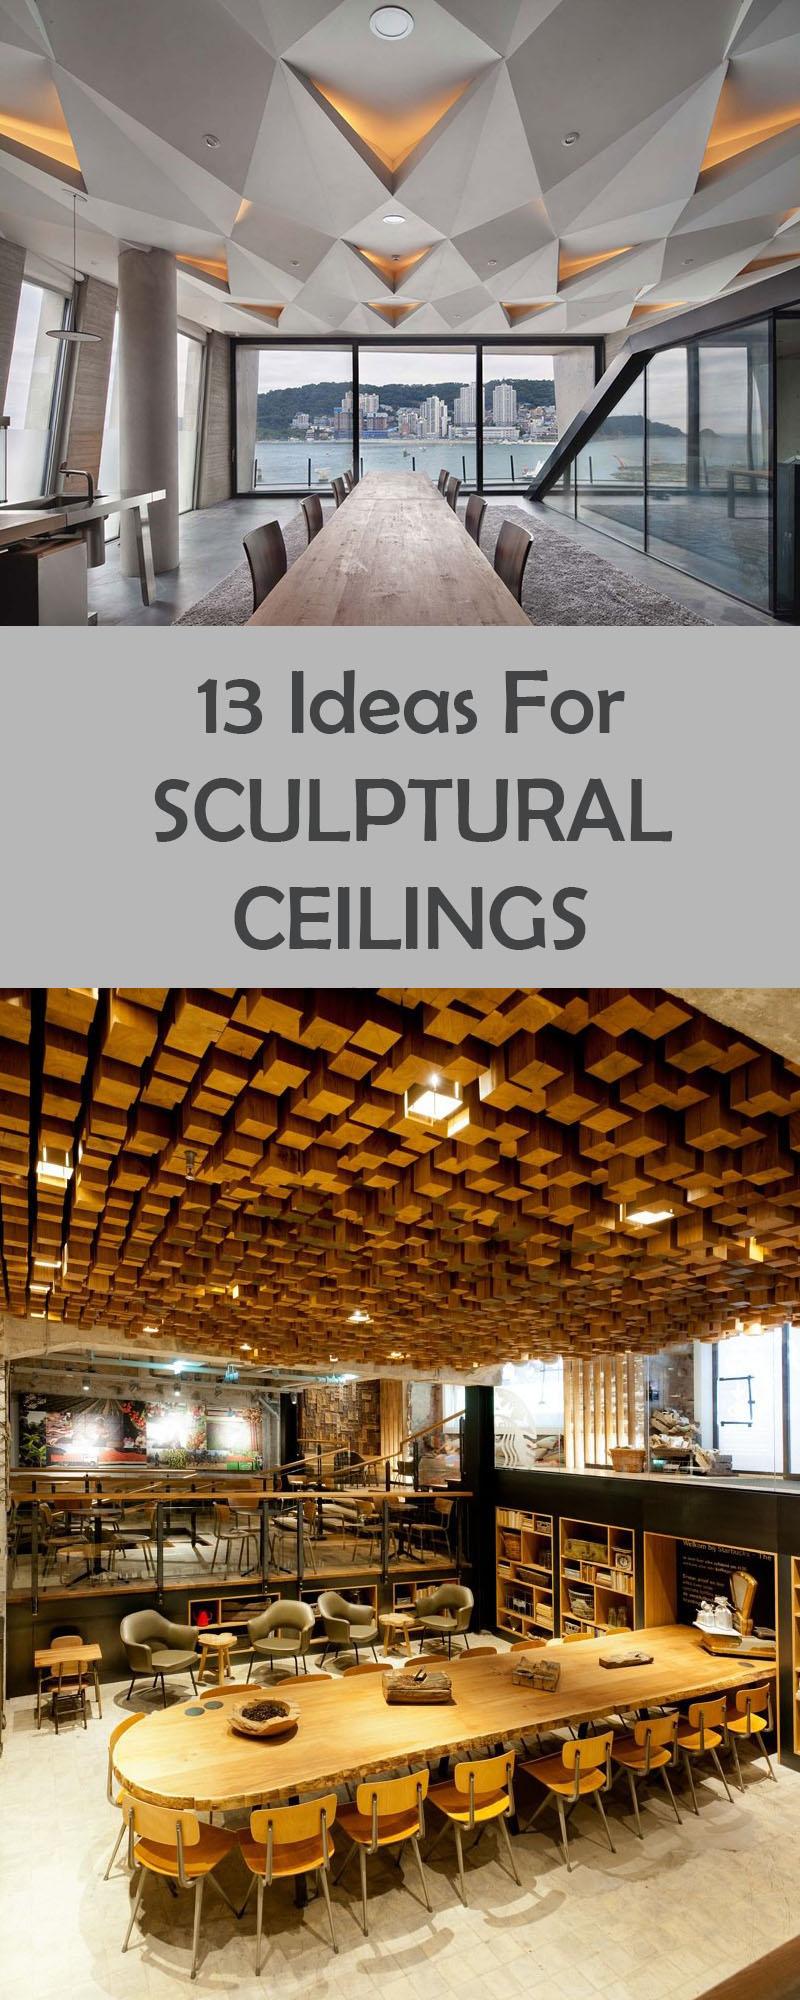 13 Ideas For Sculptural Ceilings